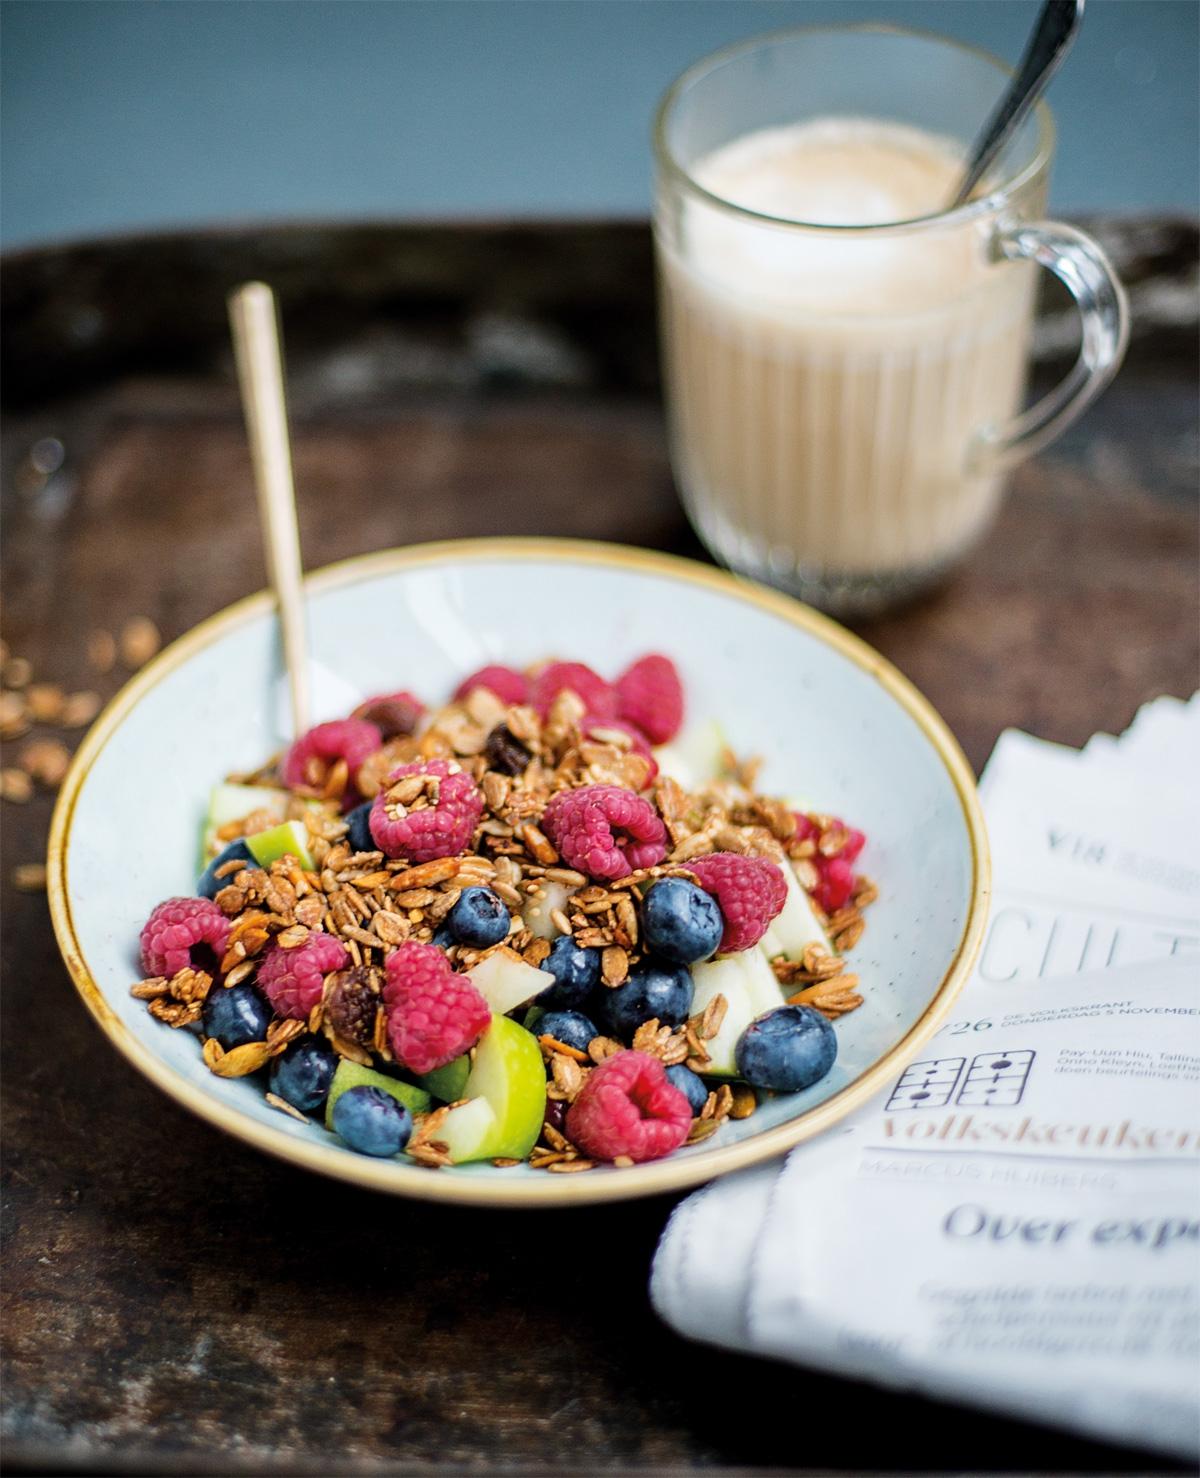 Recept Mieke: Crunchy fruitsalade met granola